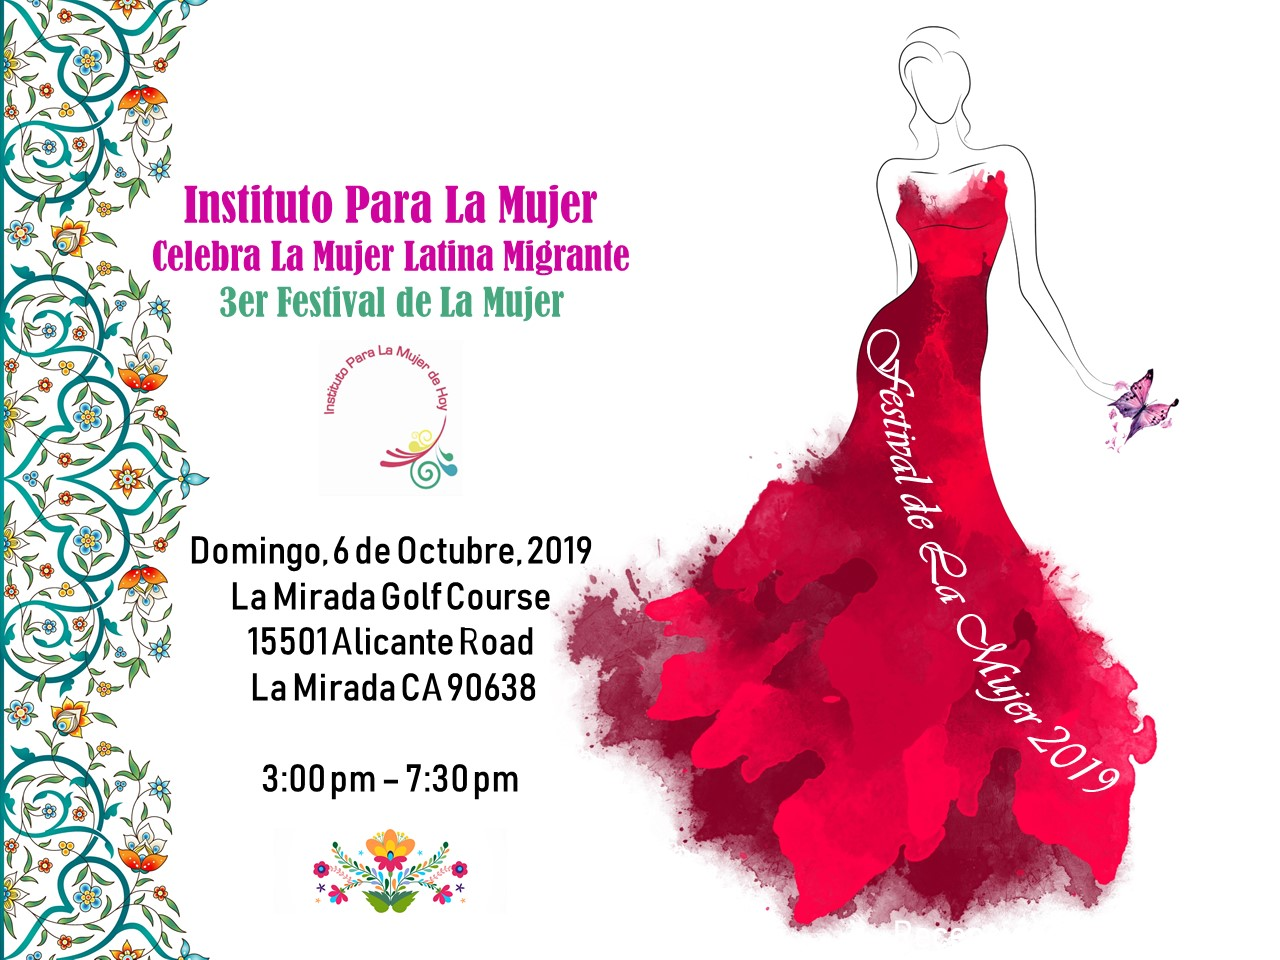 Flyer for text - Festival de La Mujer 2019.jpg